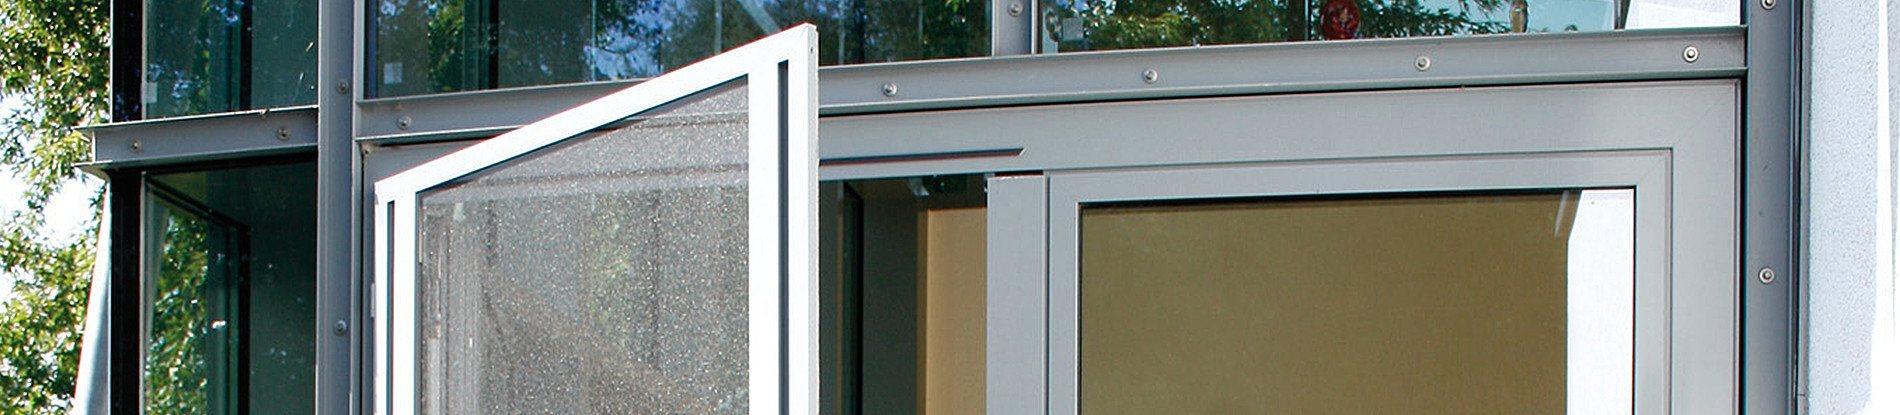 Sonnenschutz Fr Balkon Ohne Bohren Balkon protect balkonfächer